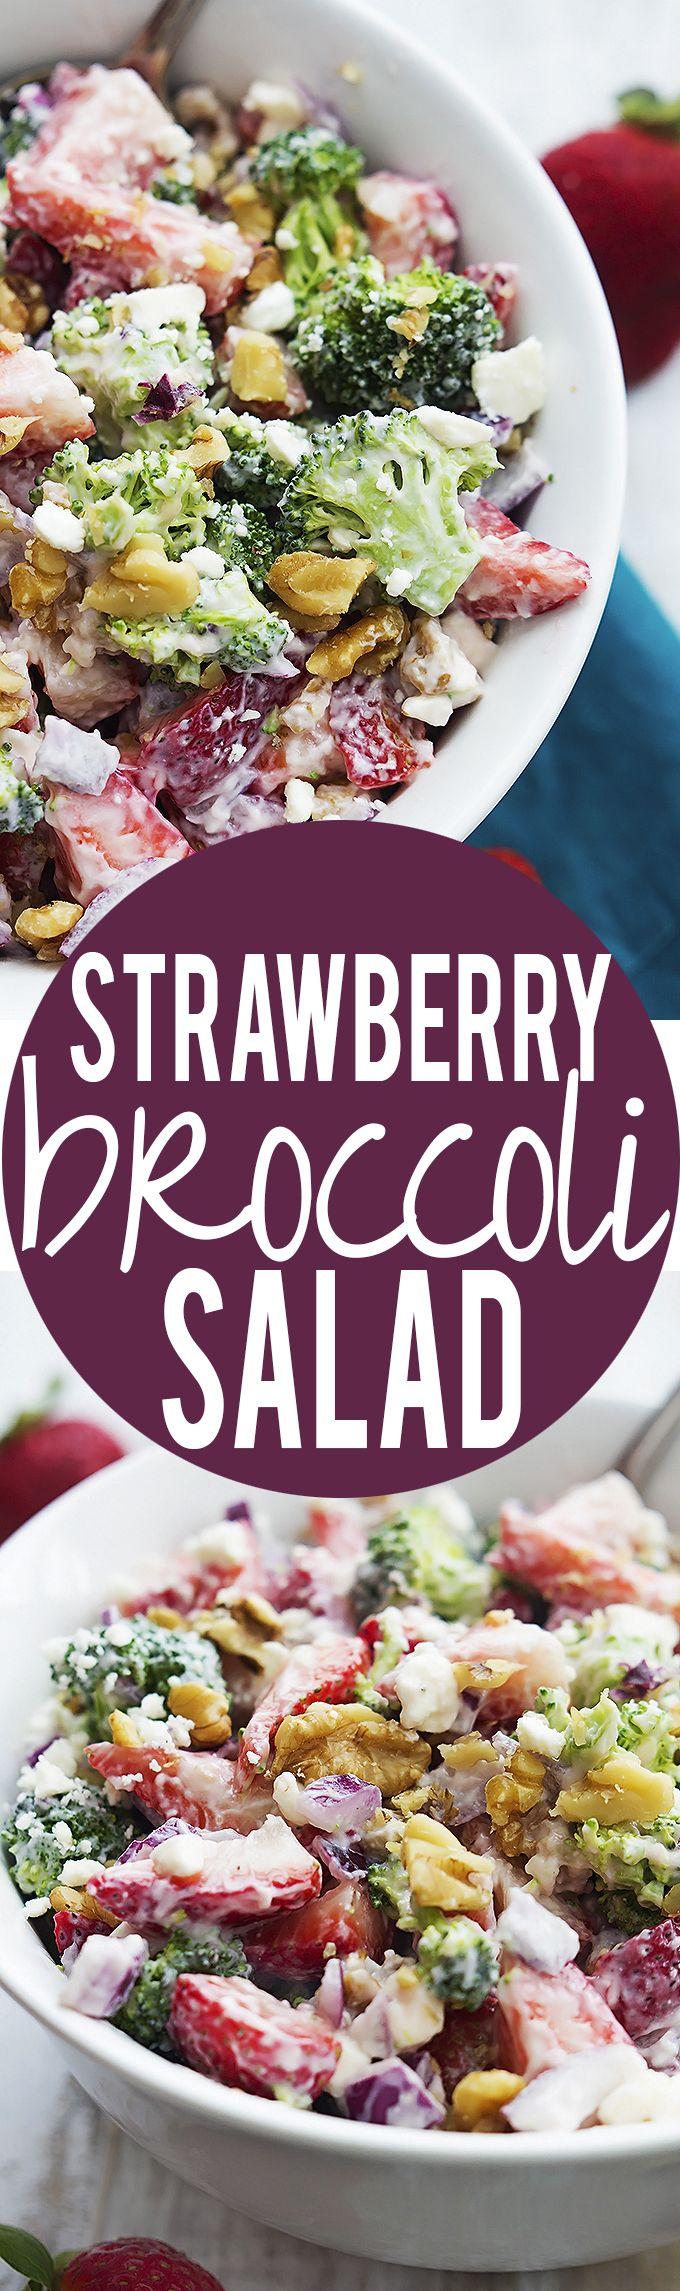 Strawberry Broccoli Salad   Creme de la Crumb